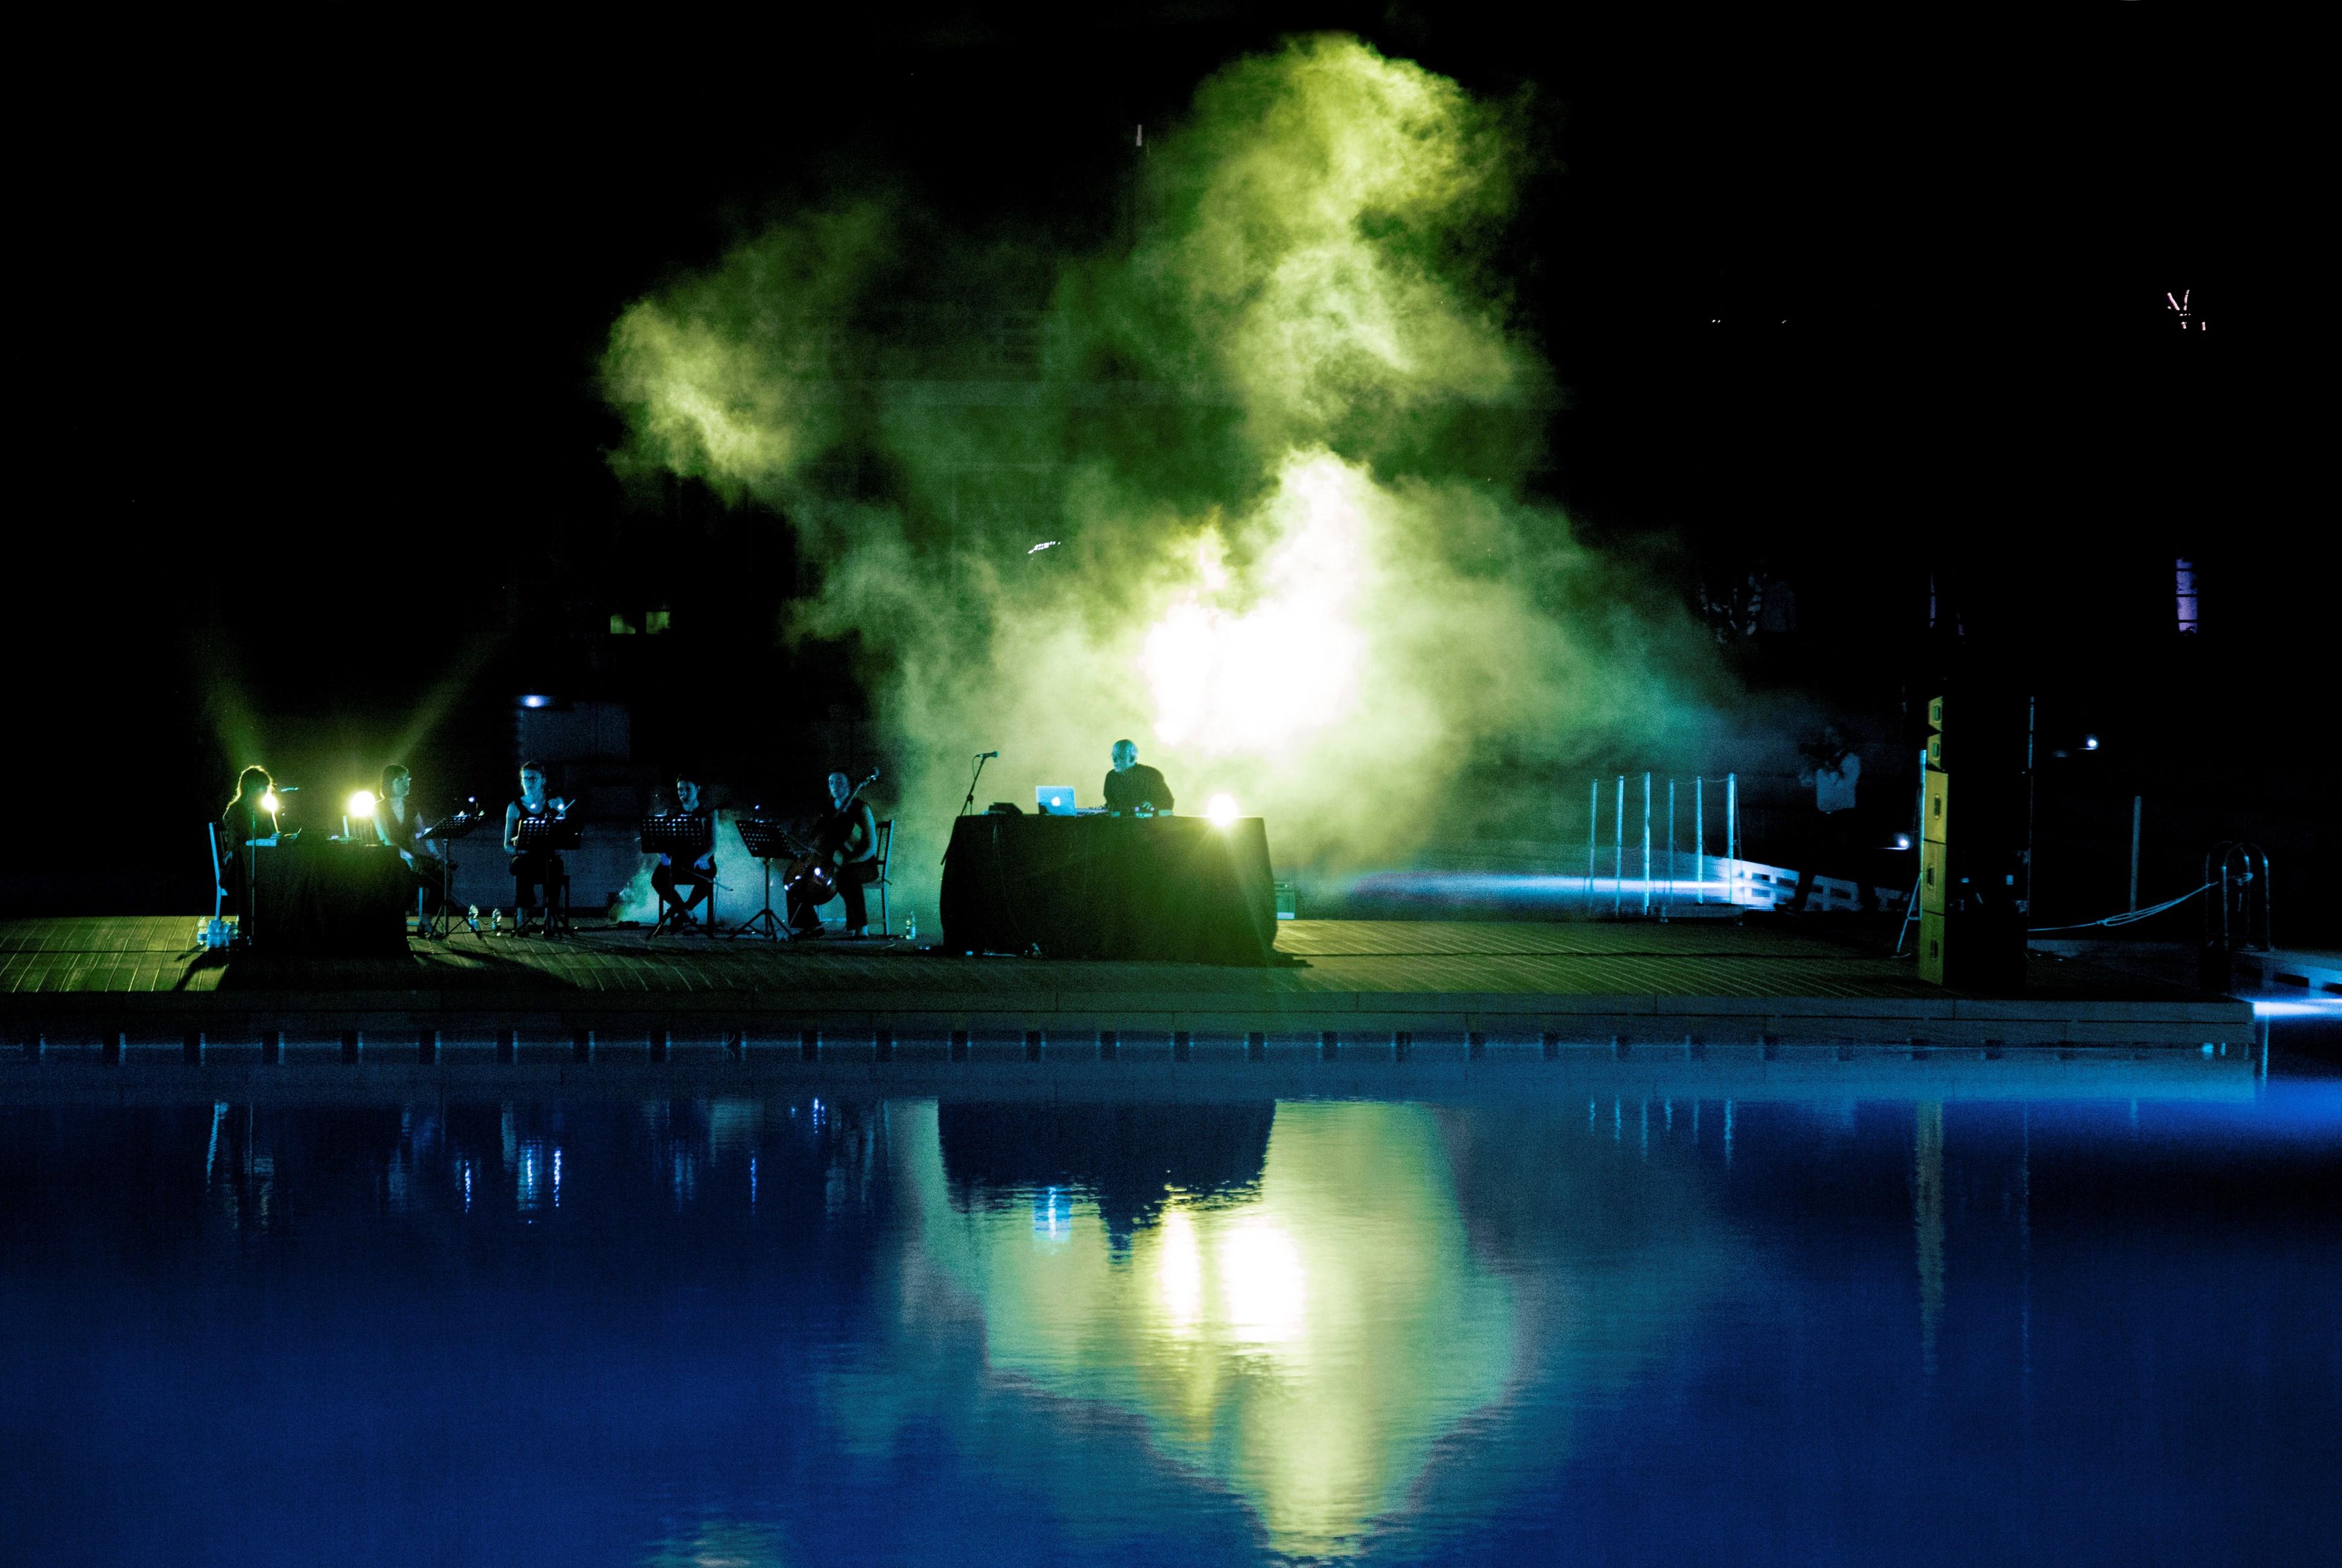 Autunno ai Bagni Misteriosi, Teatro Franco Parenti